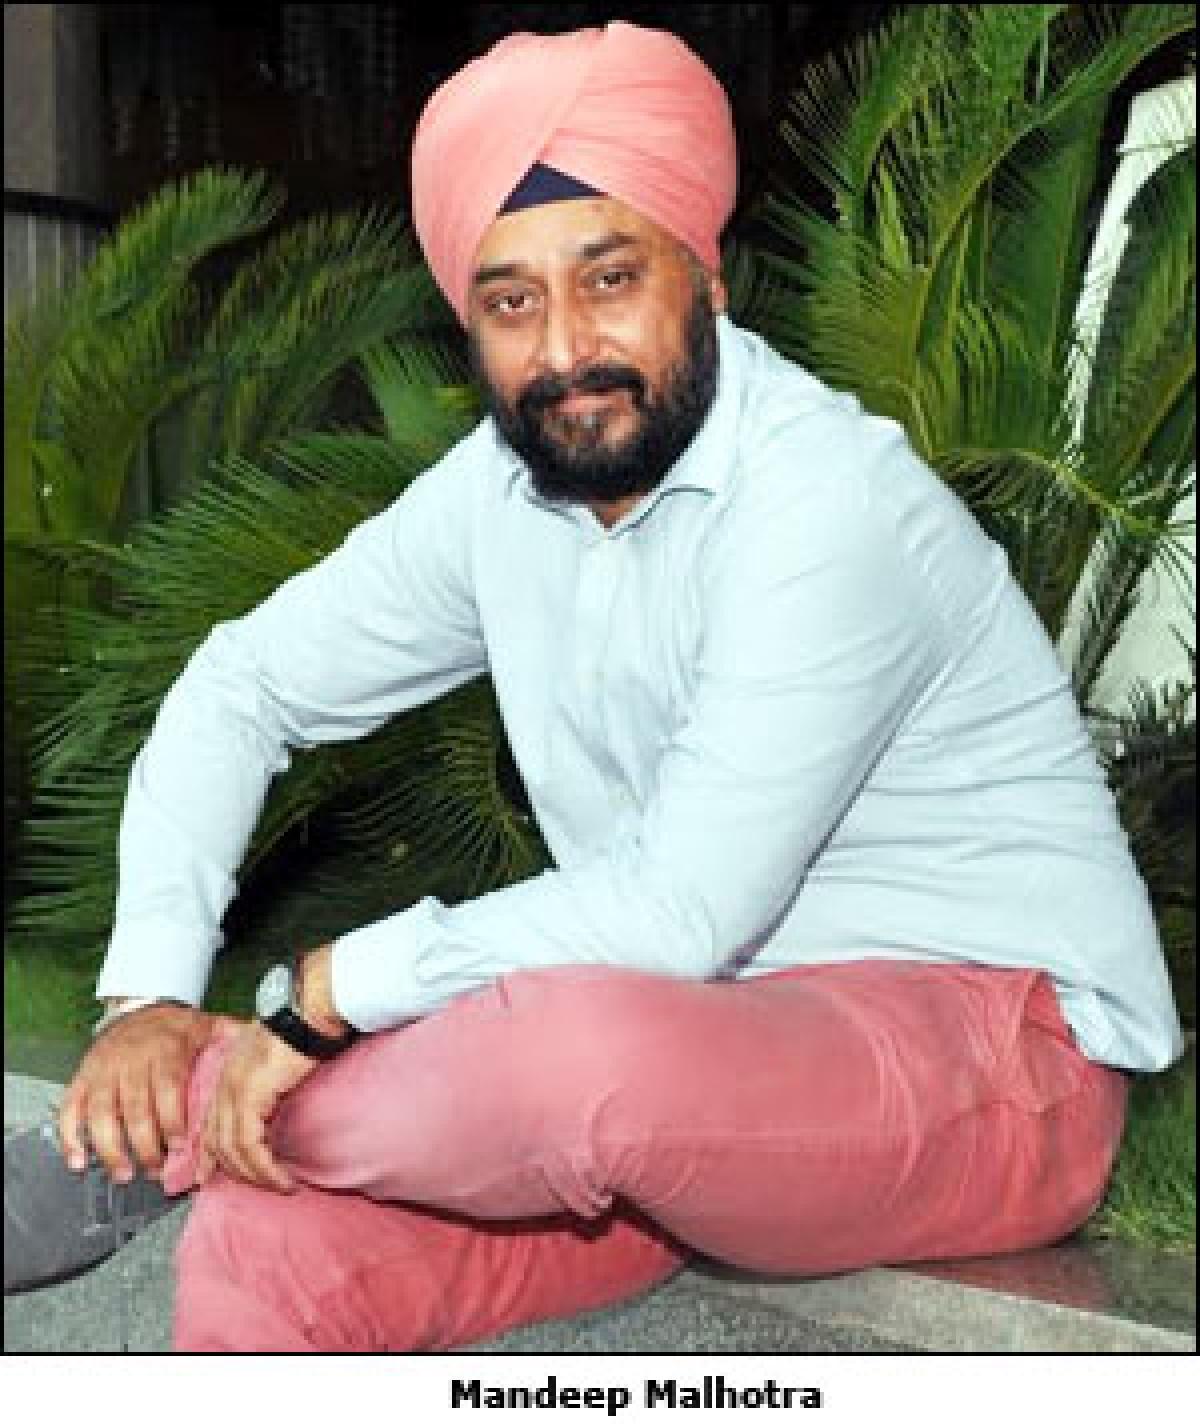 Profile: Mandeep Malhotra: The 'Rocket Singh' of Outdoor